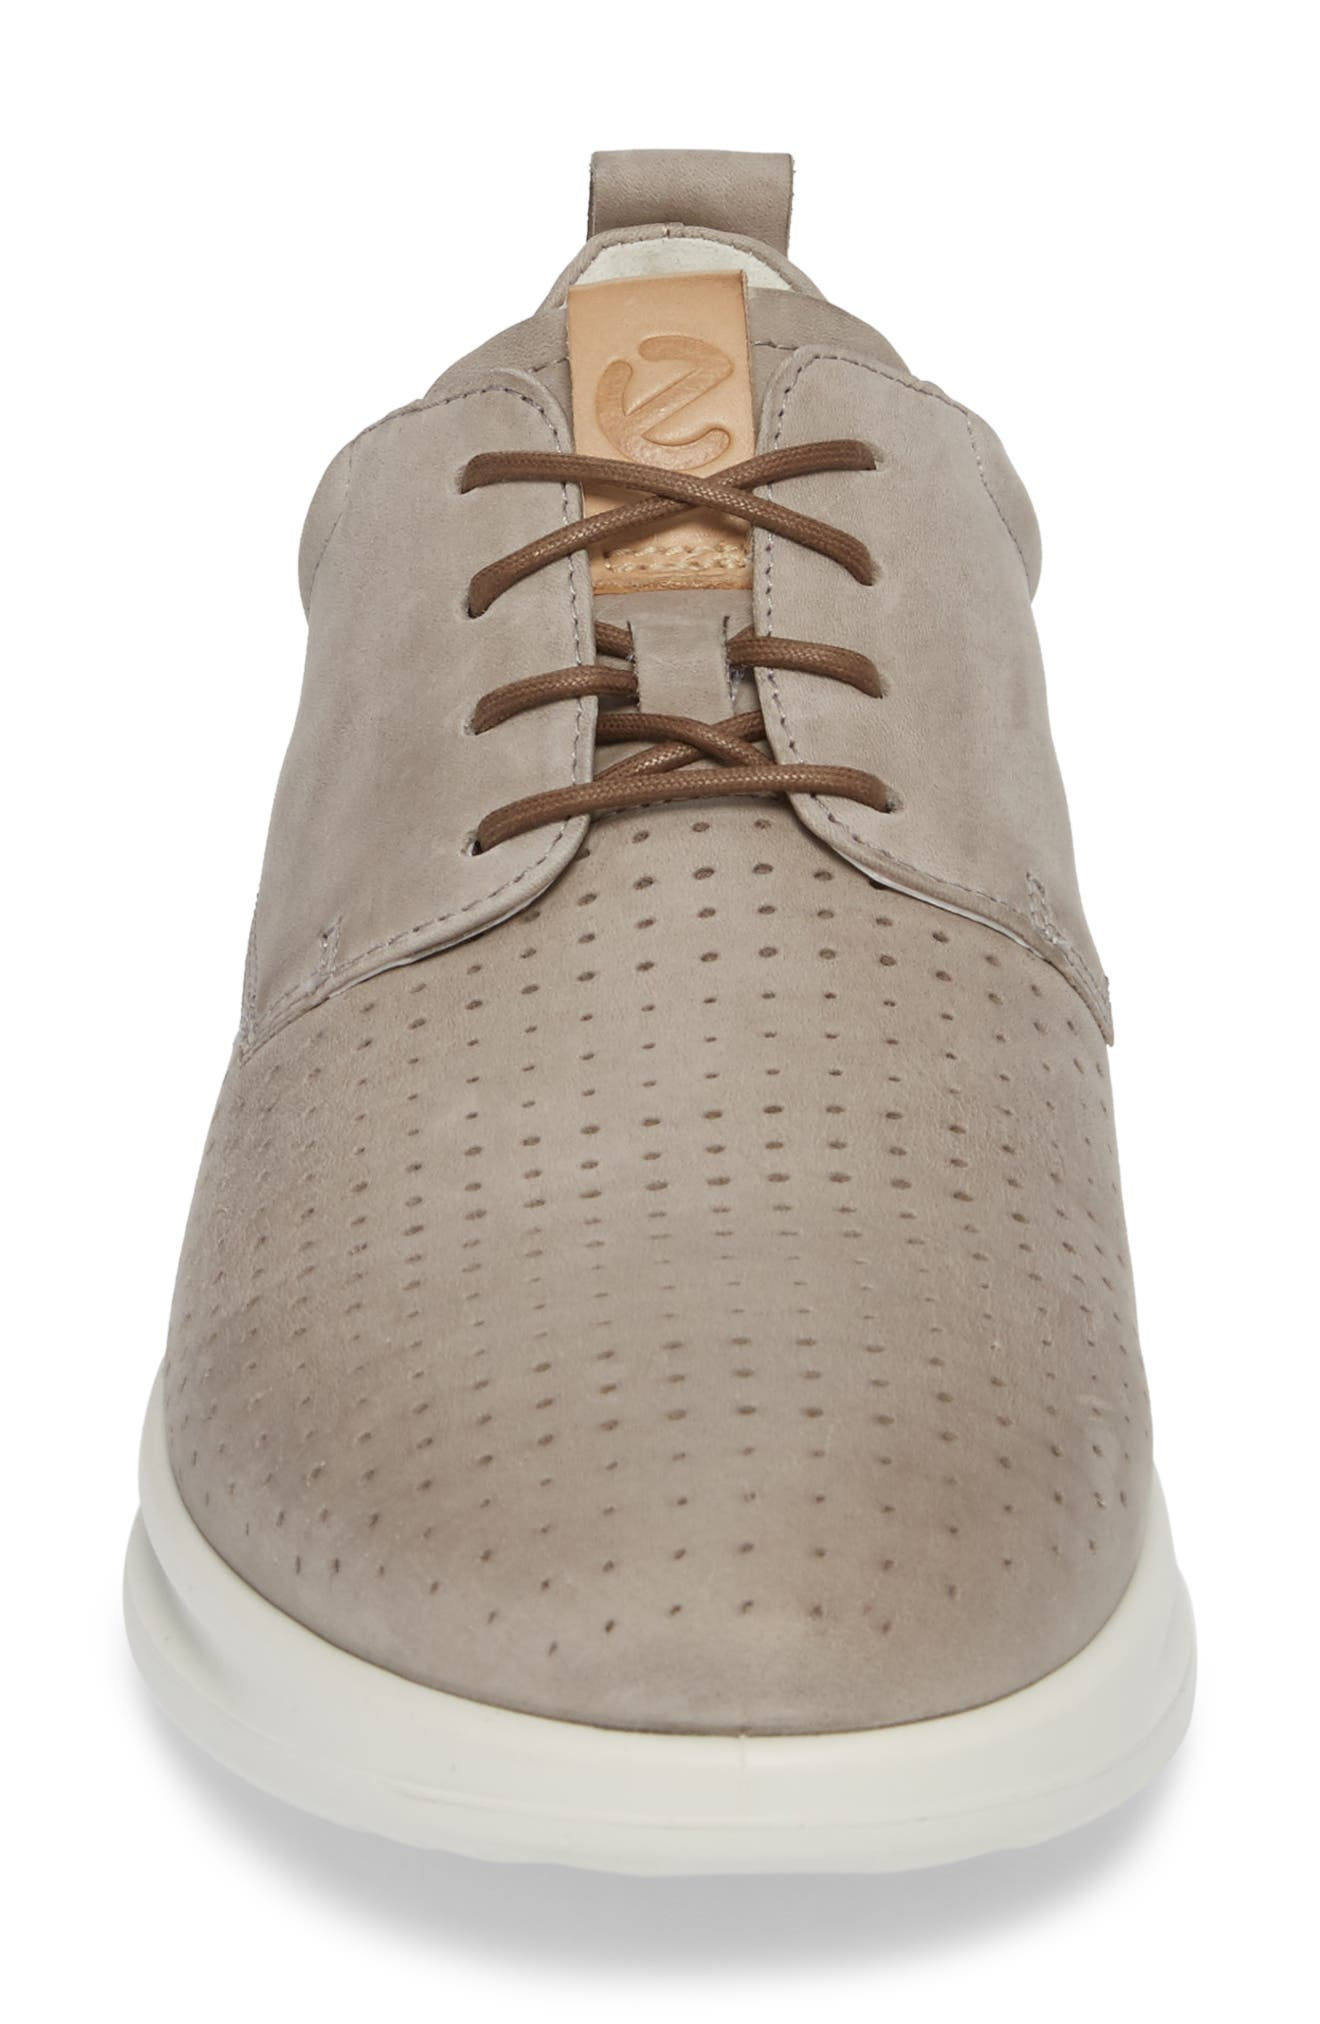 Aquet Sneaker,                             Alternate thumbnail 4, color,                             MOON ROCK LEATHER